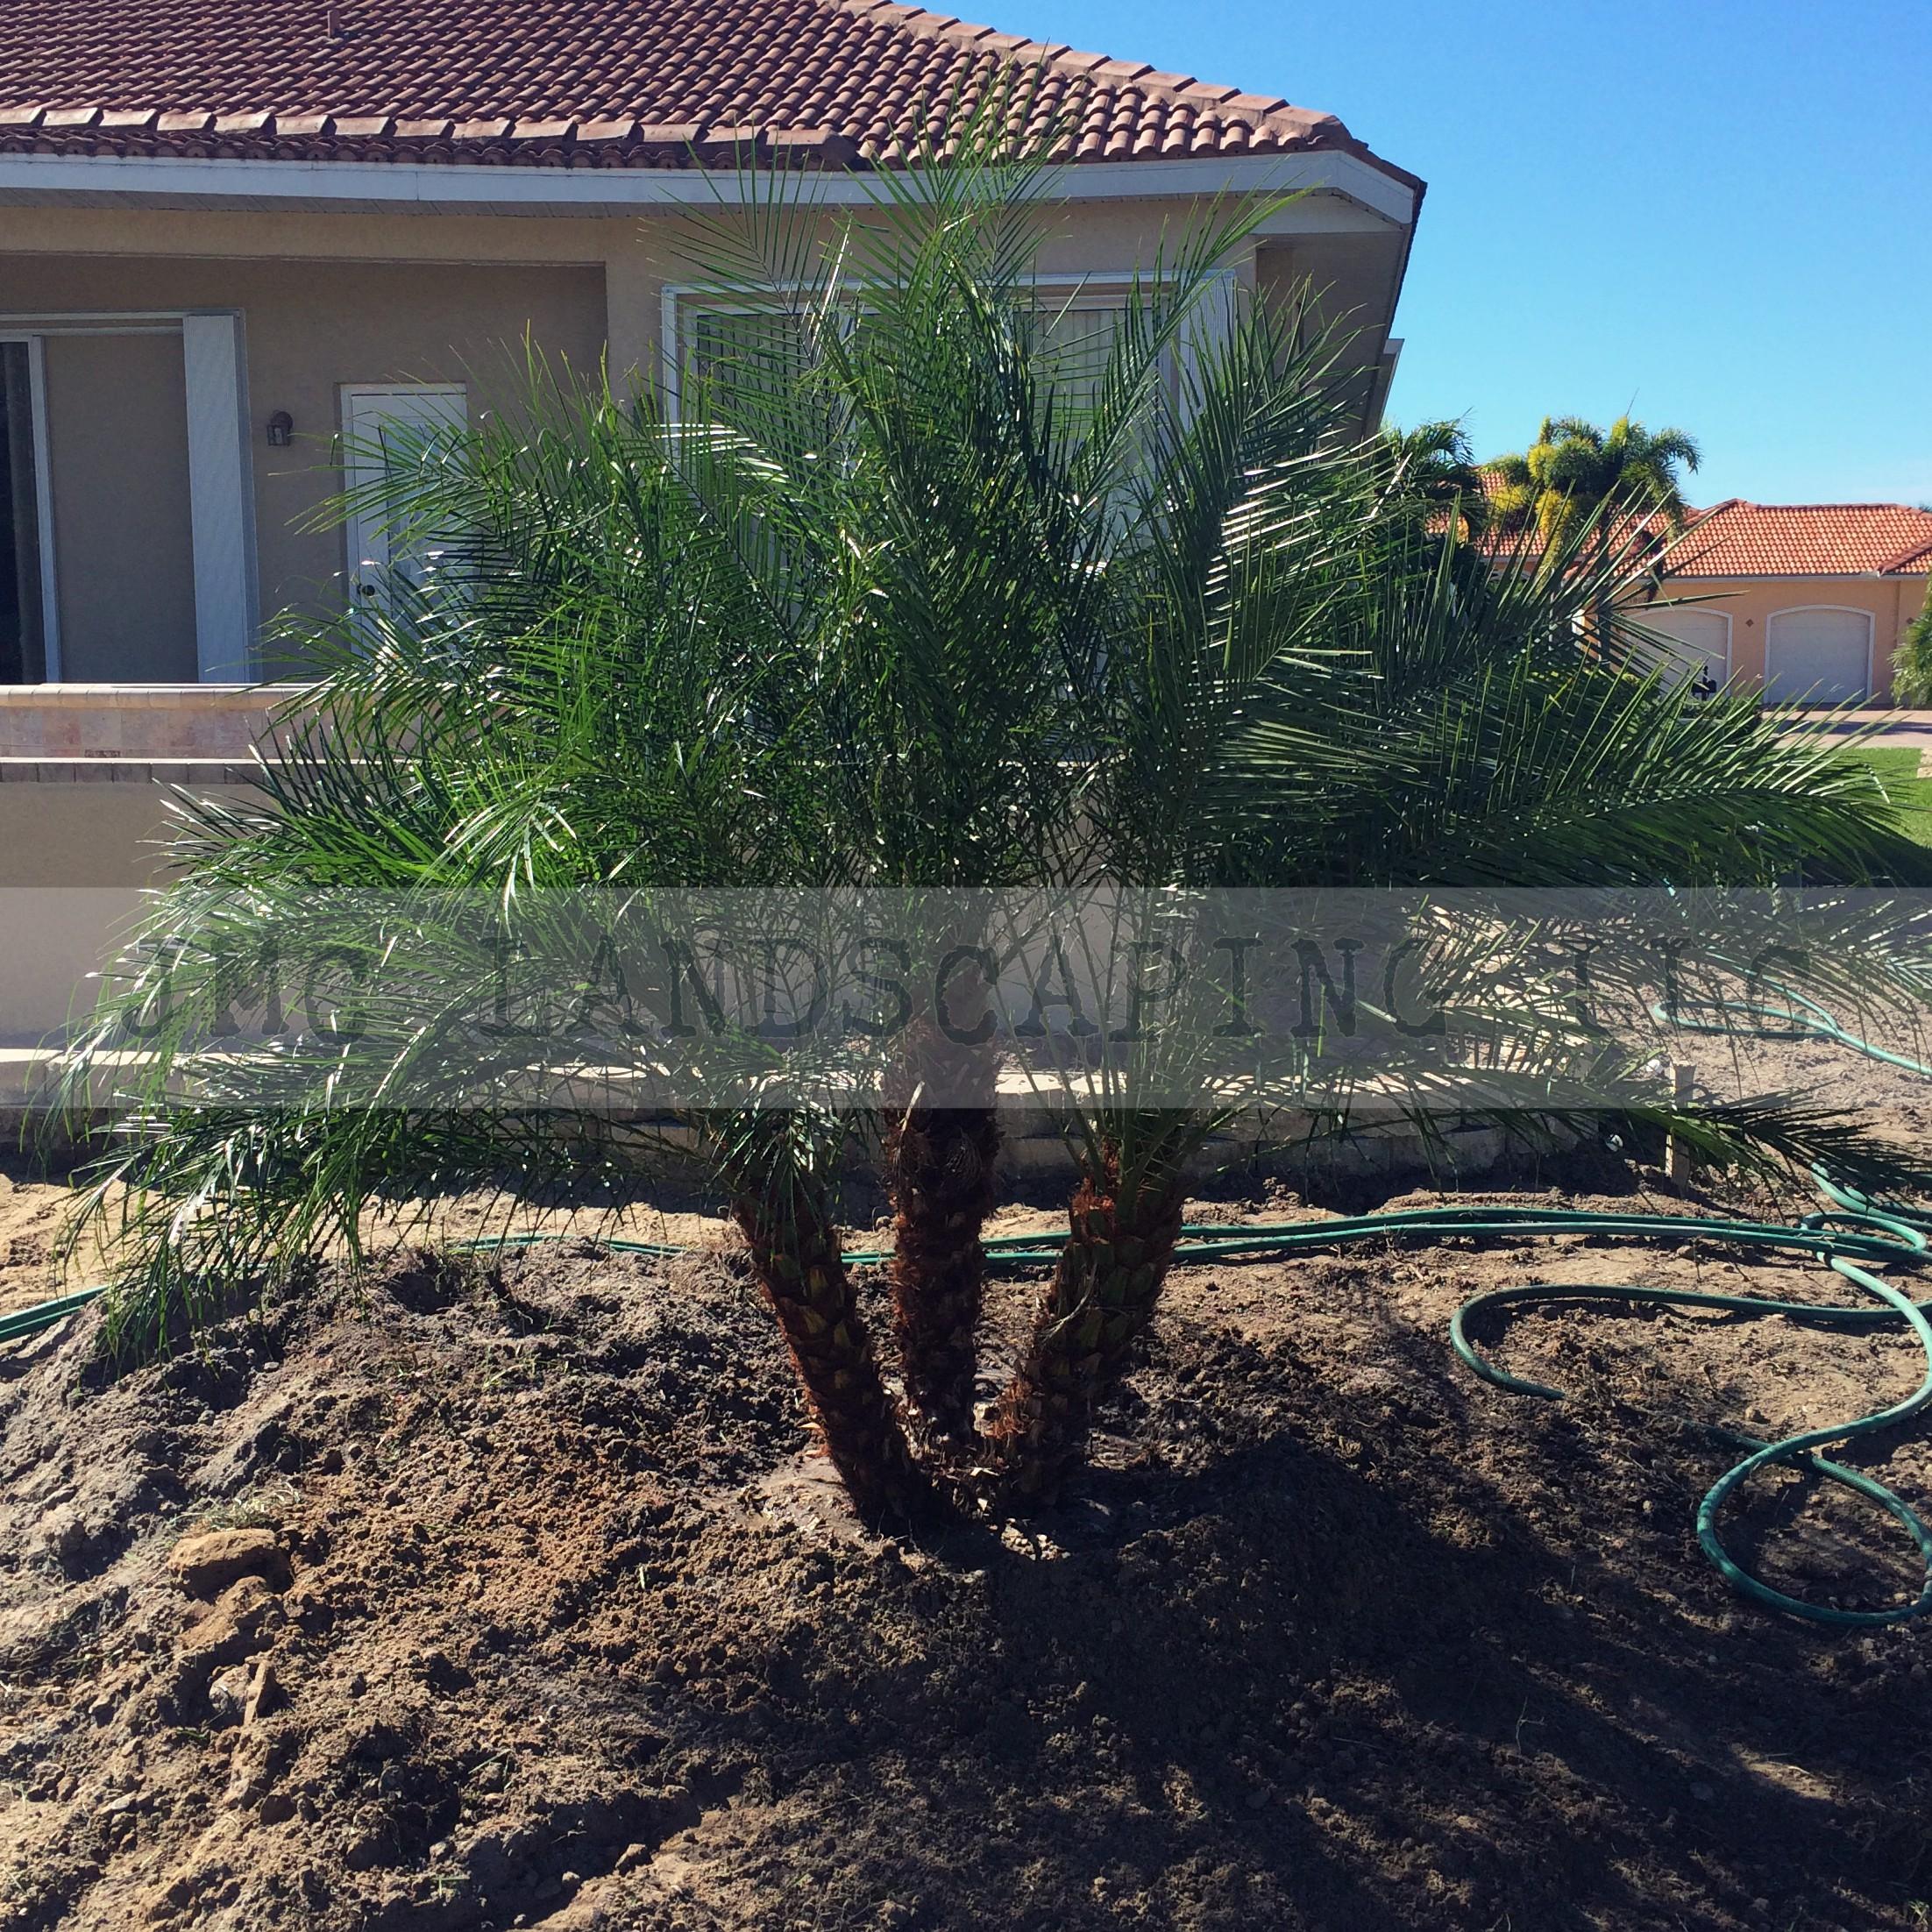 Roebelenii Palm